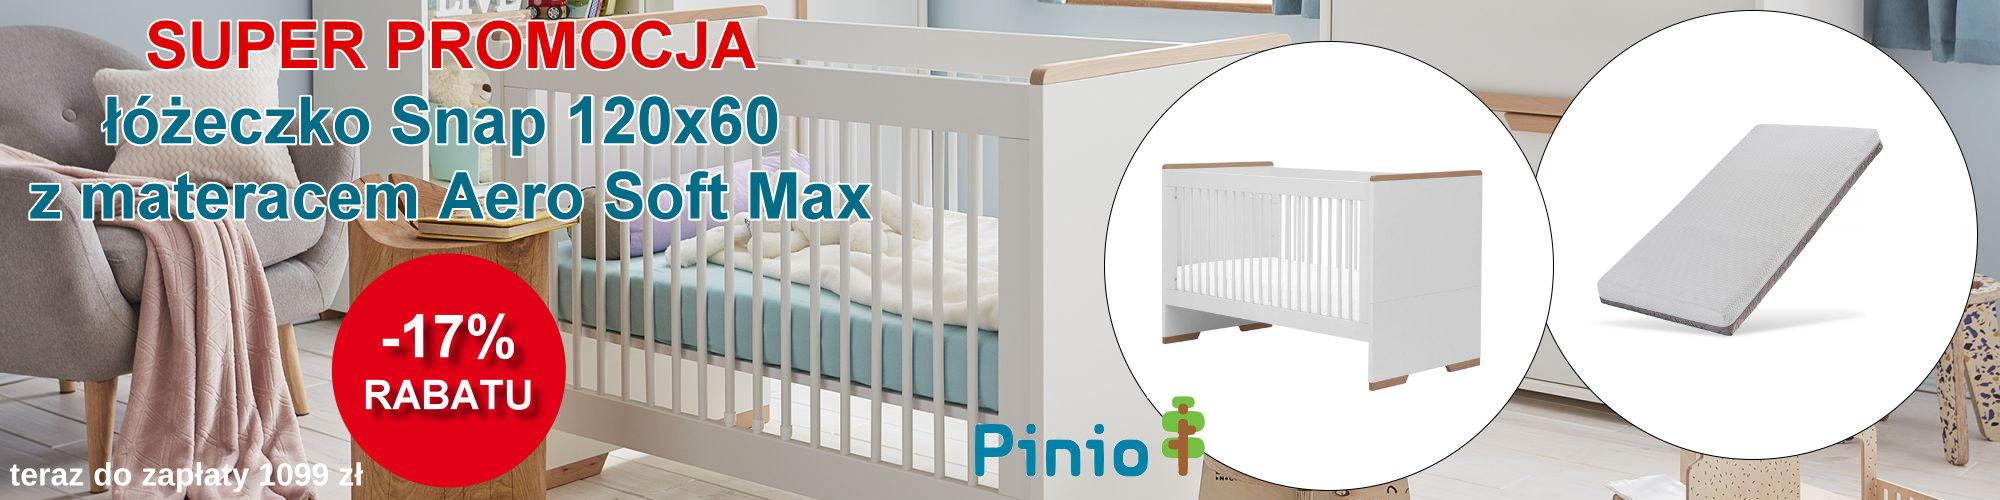 Pinio łóżeczko Snap z materacem Aero Soft Max